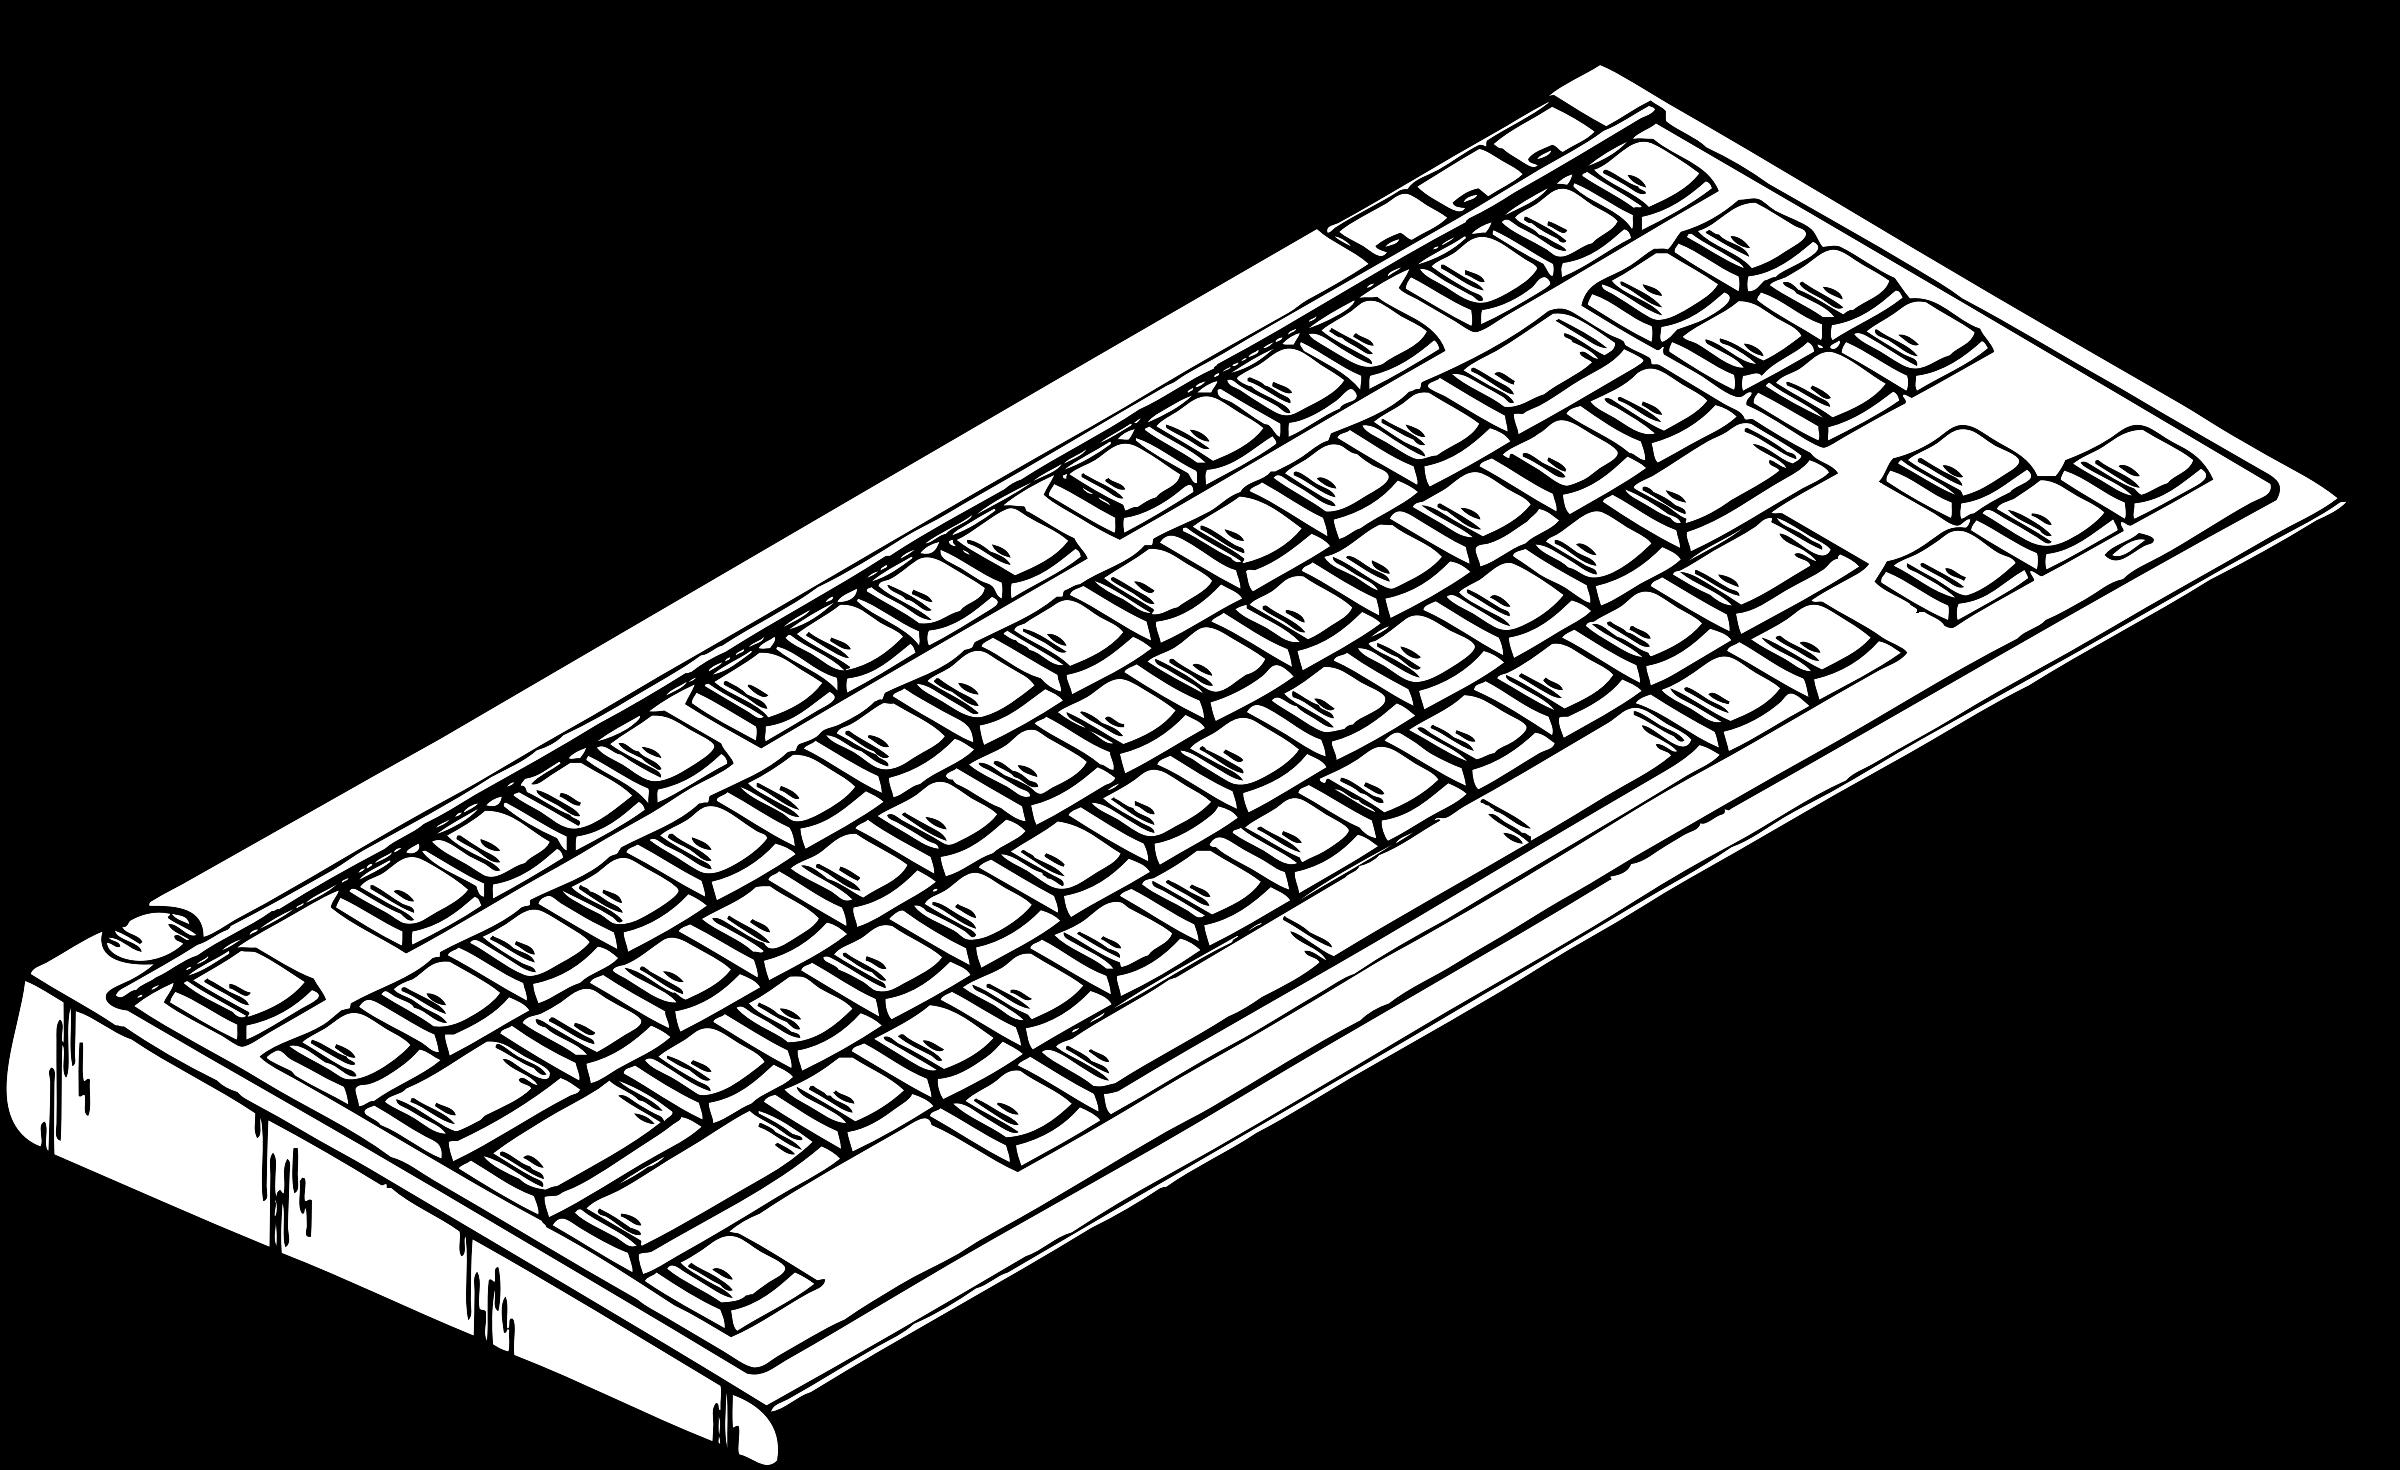 Clipart computer keyboard. Big image png